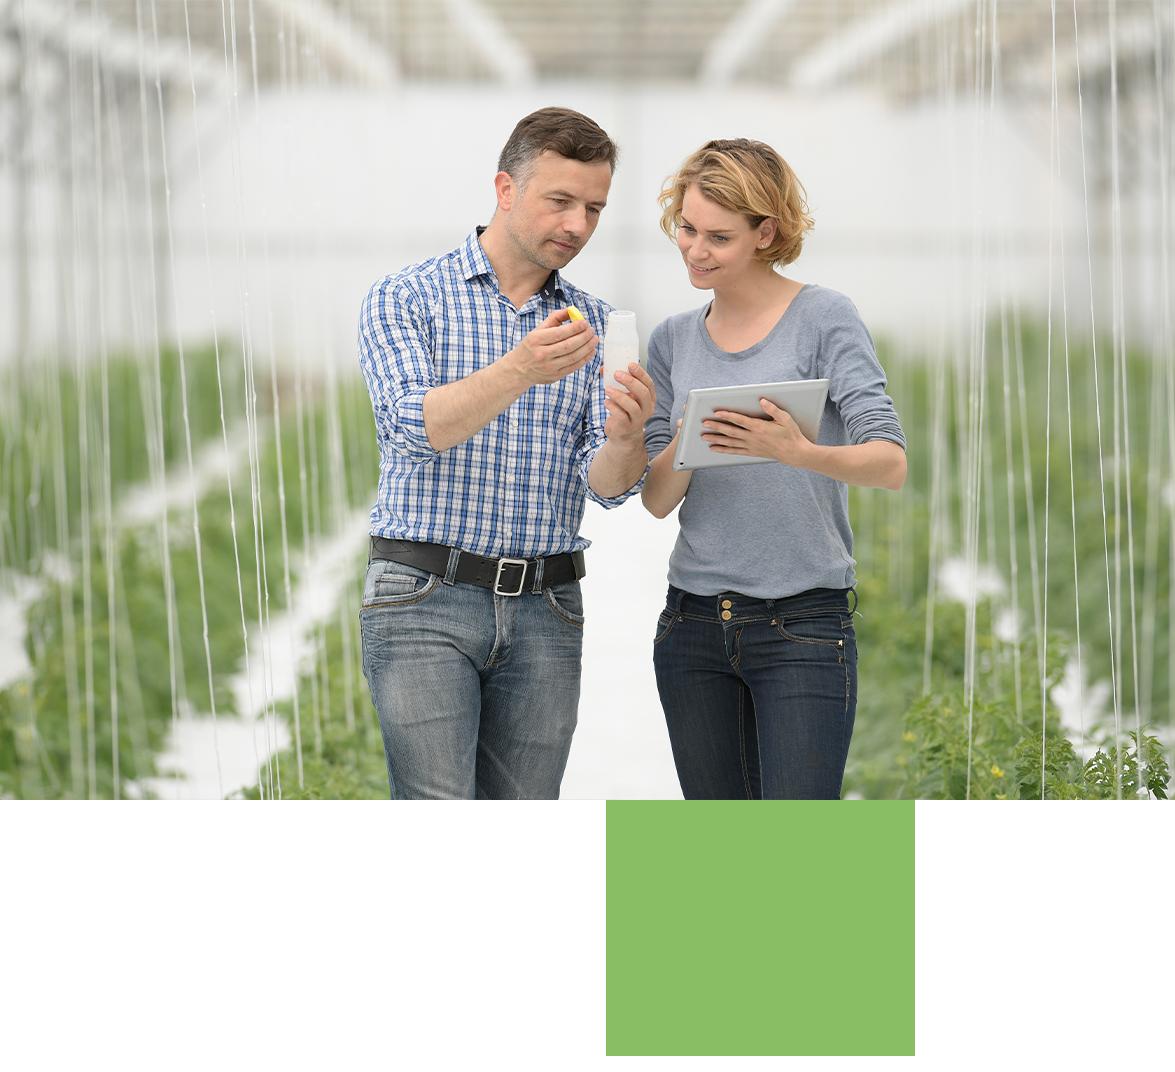 People using CropTrak in Greenhouse